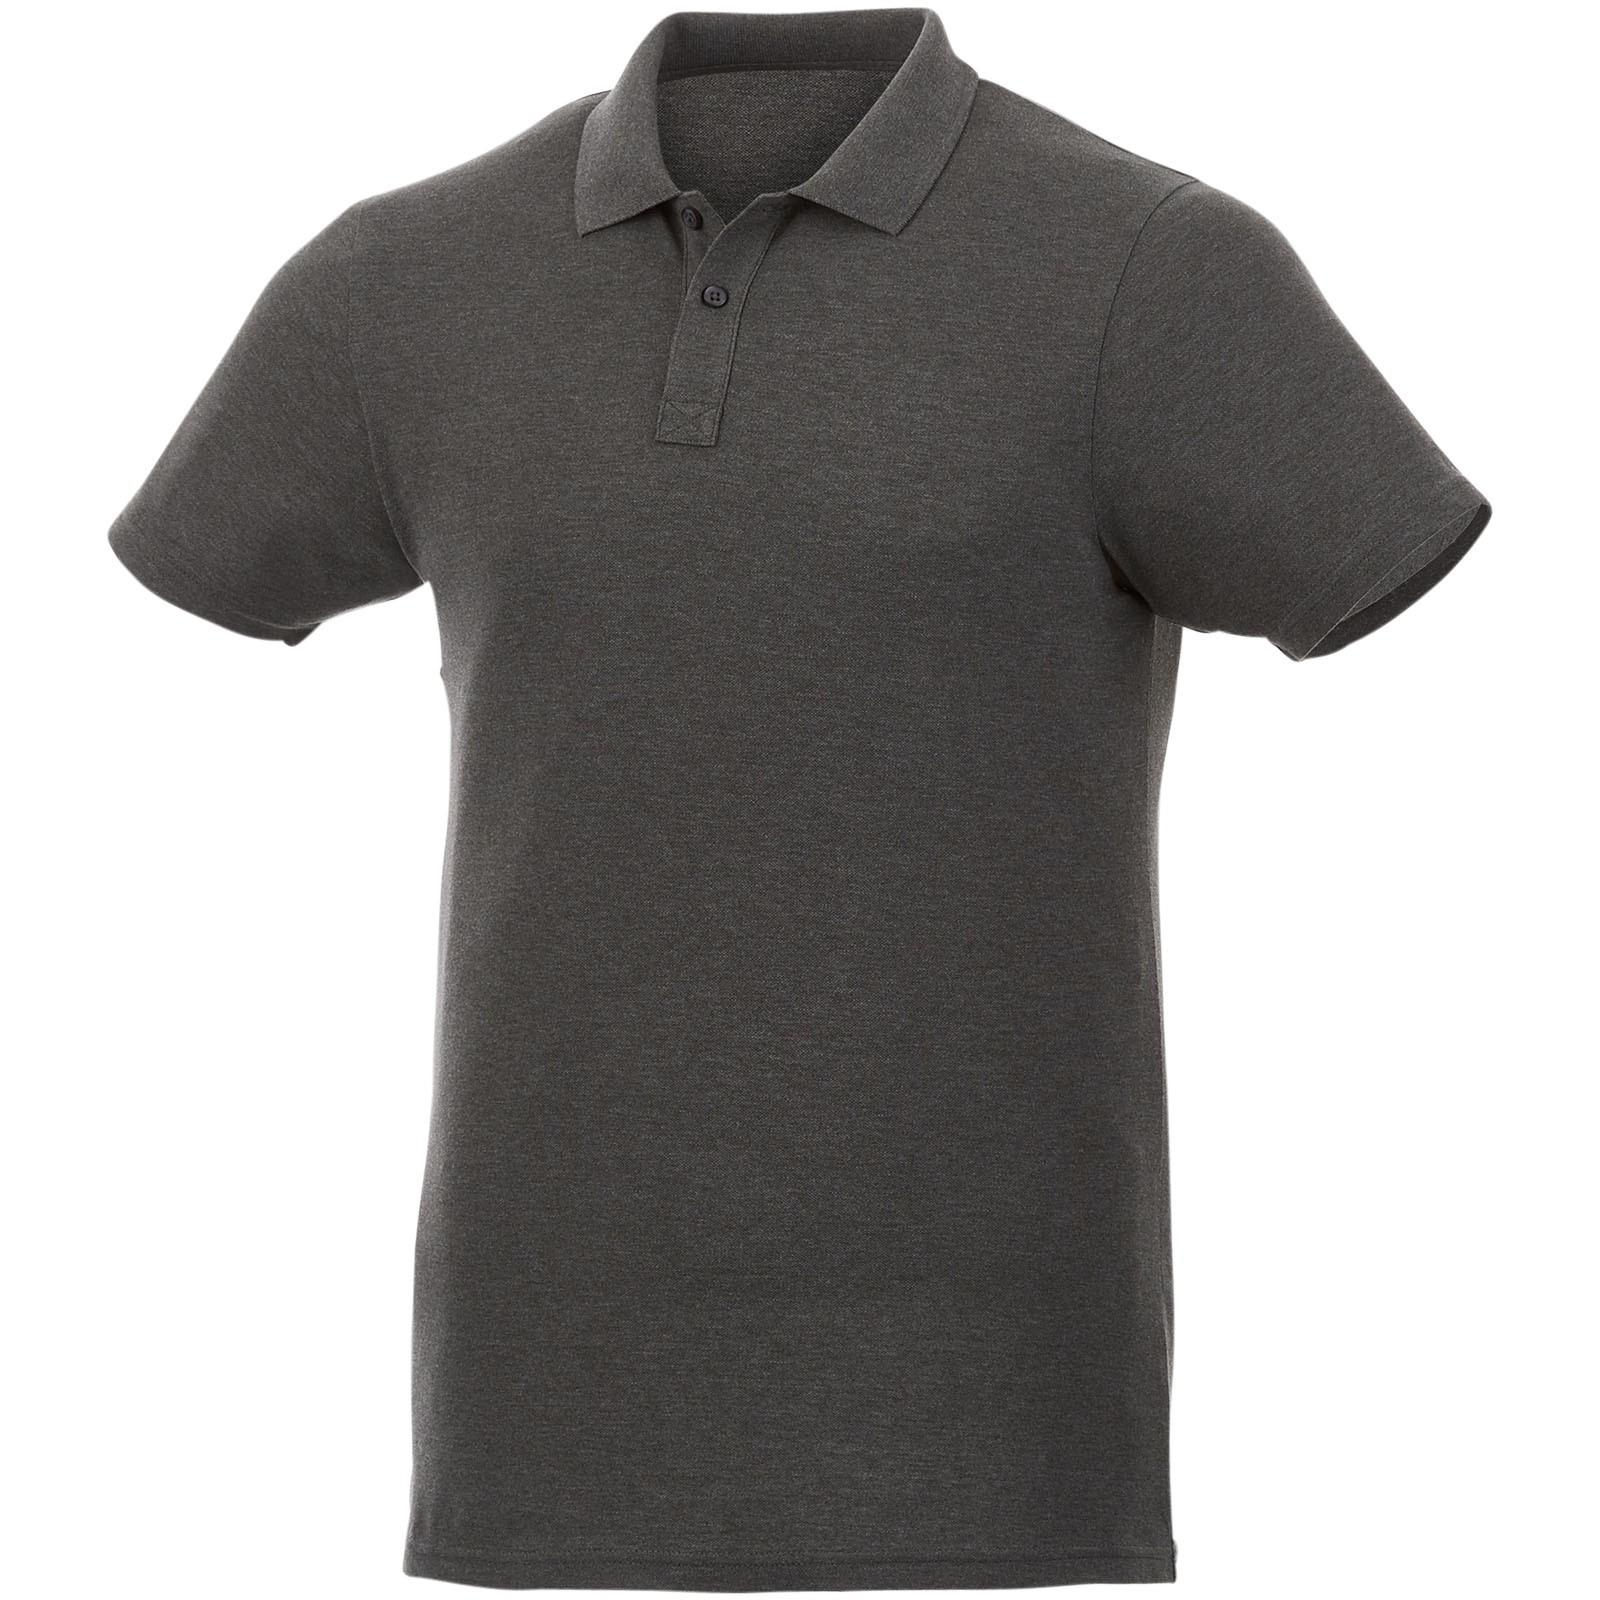 Liberty short sleeve men's polo - Charcoal / S